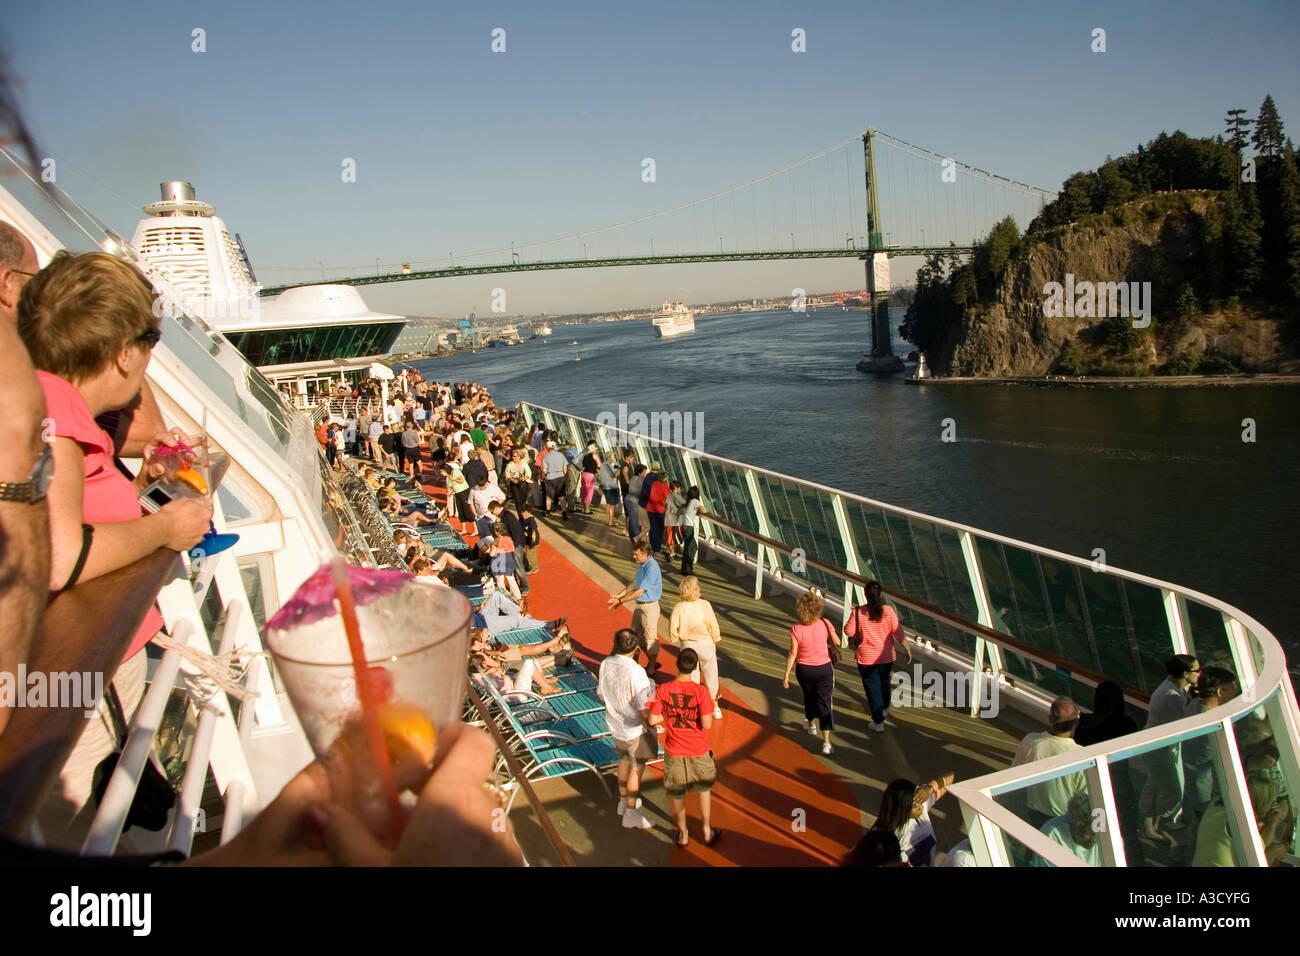 Passenger leaving Vancouver for Alaska Cruise leaving Vancouver B.C. Canada - Stock Image